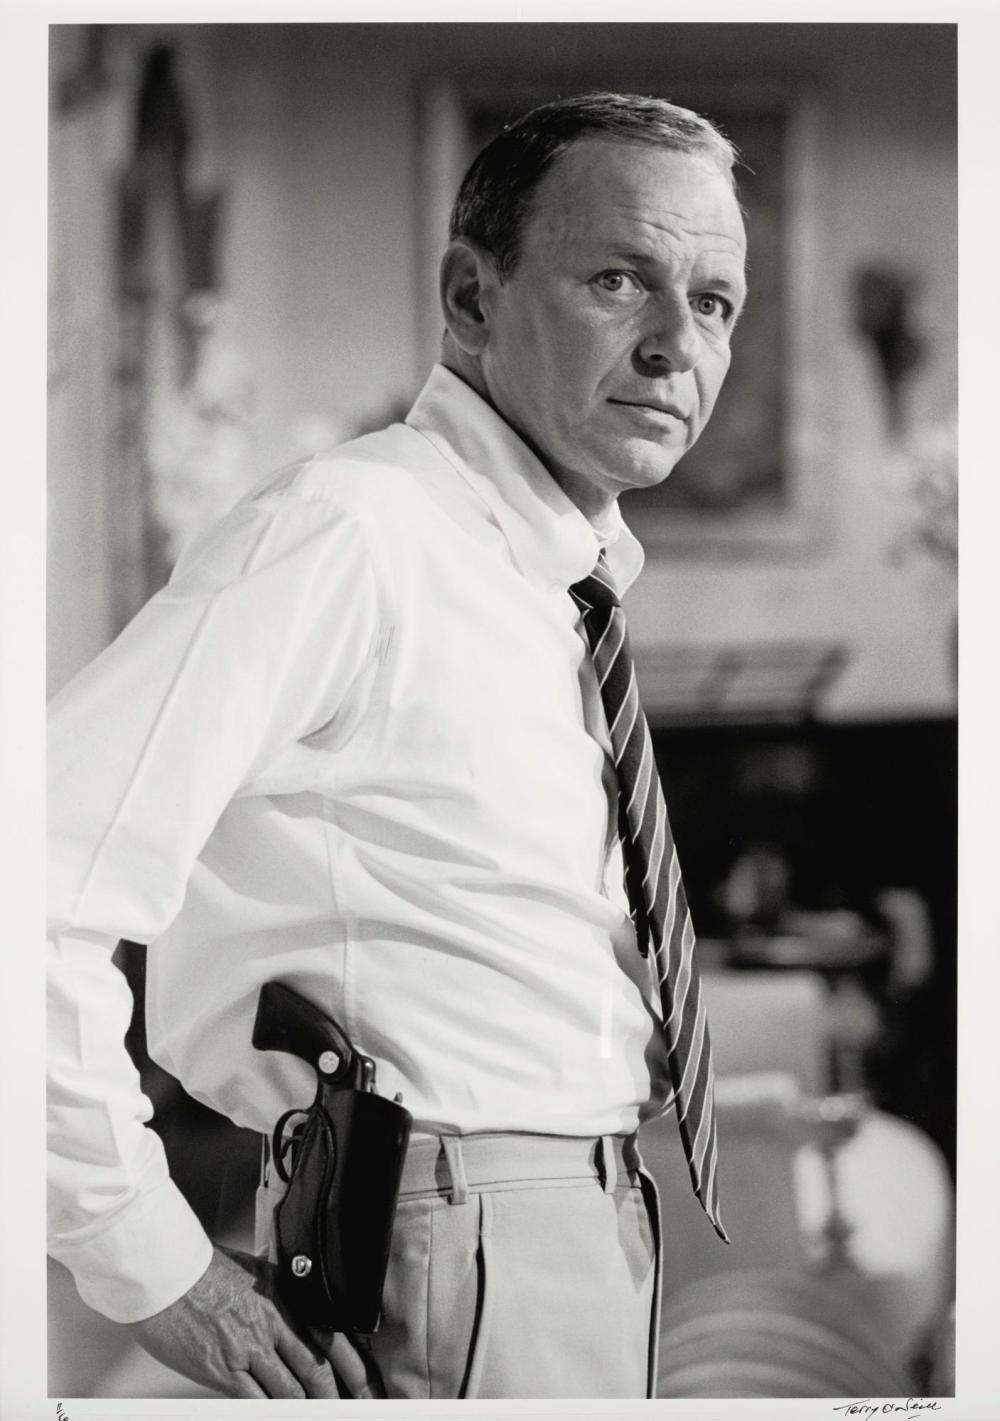 TERRY O'NEILL | Frank Sinatra with Gun, Miami Beach, 1968